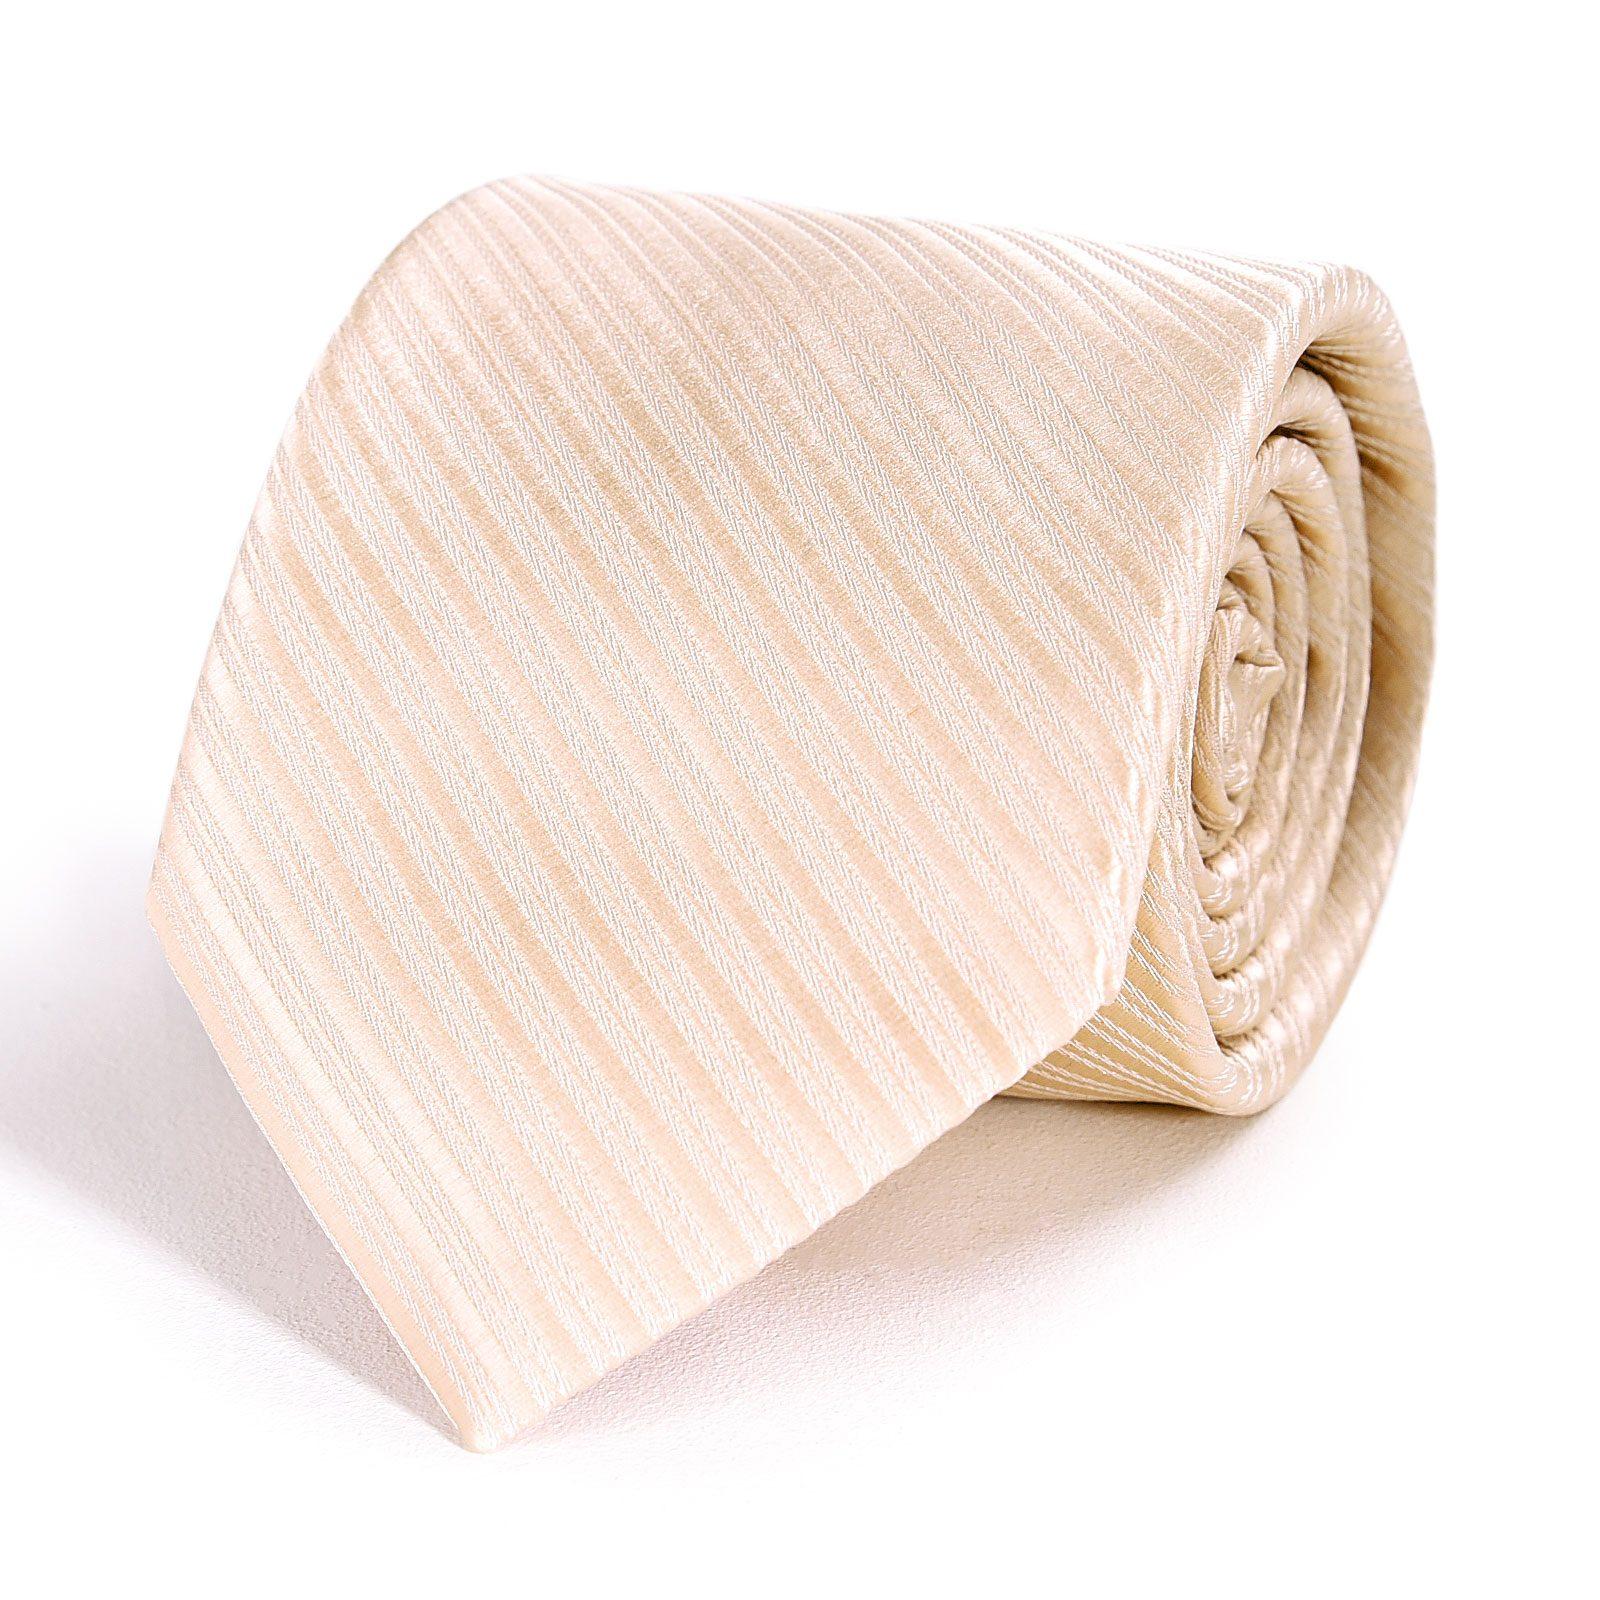 http://lookbook.allee-du-foulard.fr/wp-content/uploads/2018/11/CV-00344-F16-cravate-faux-uni-champagne-1600x1600.jpg